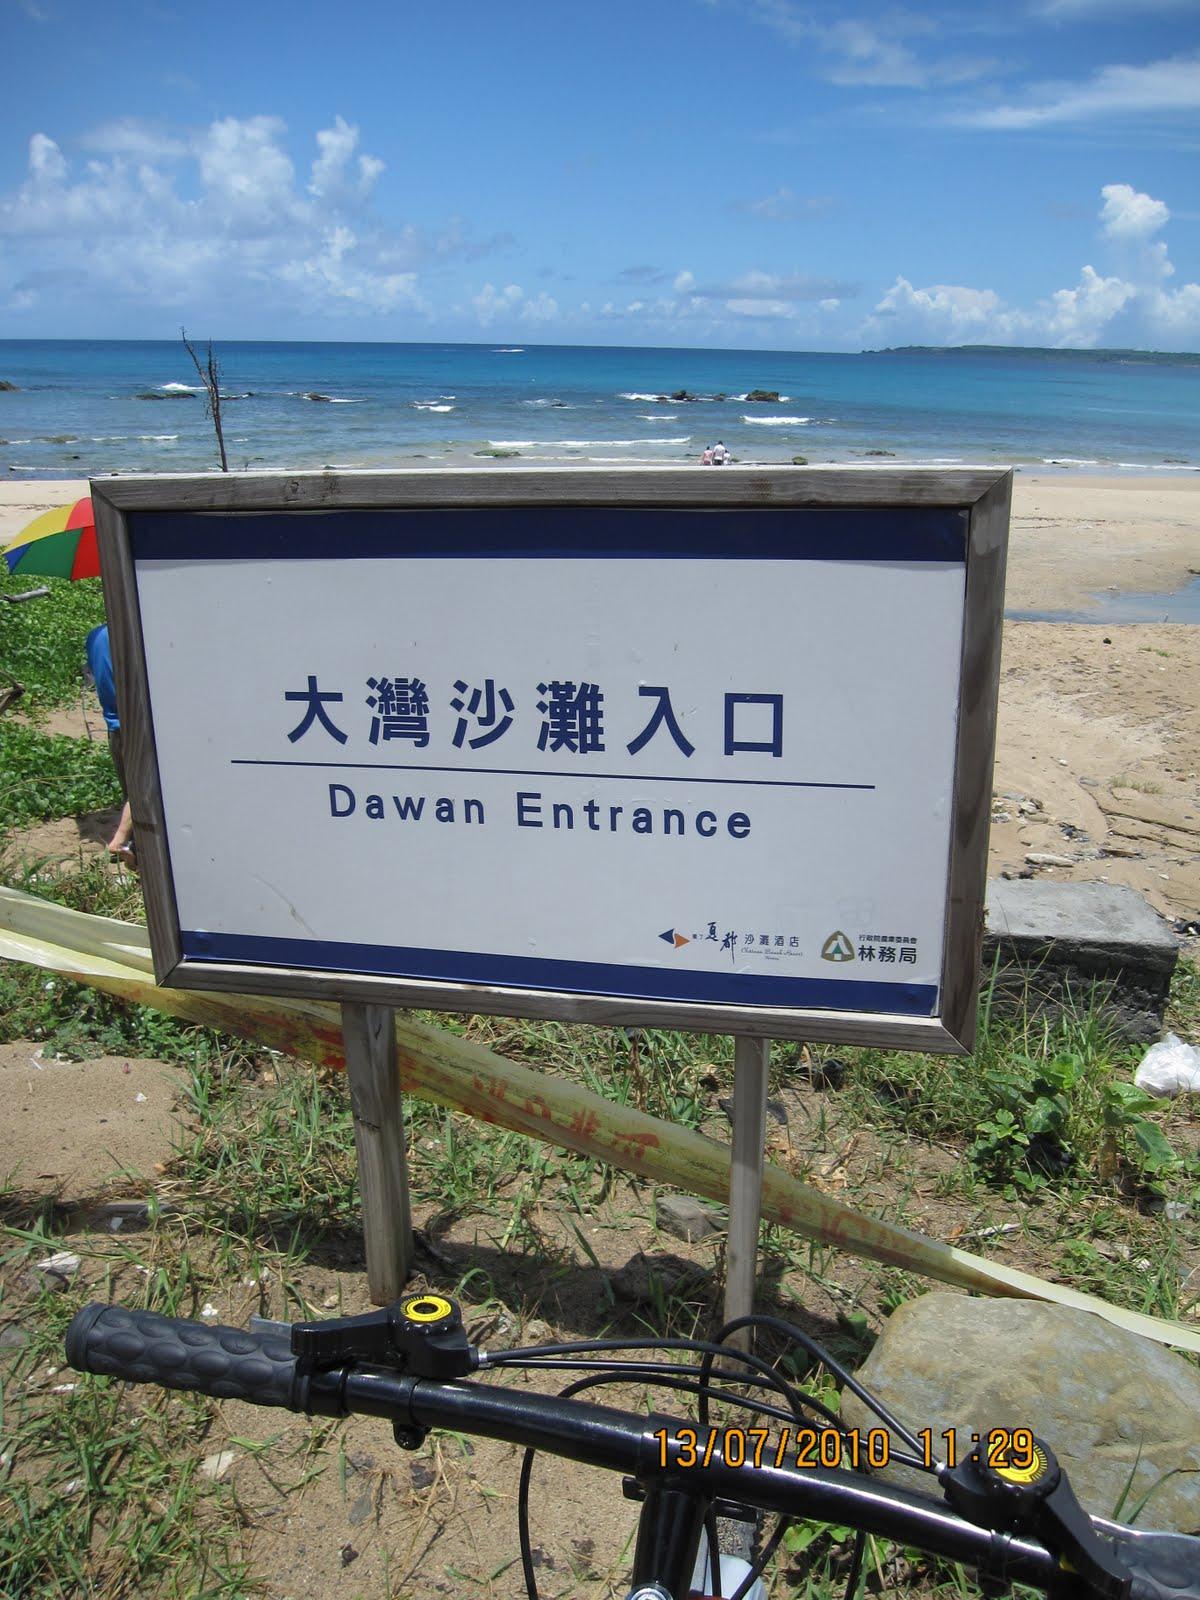 Welcome to Sze's Wonder World: My Taiwan Trip (12 July - 18 July 2010)